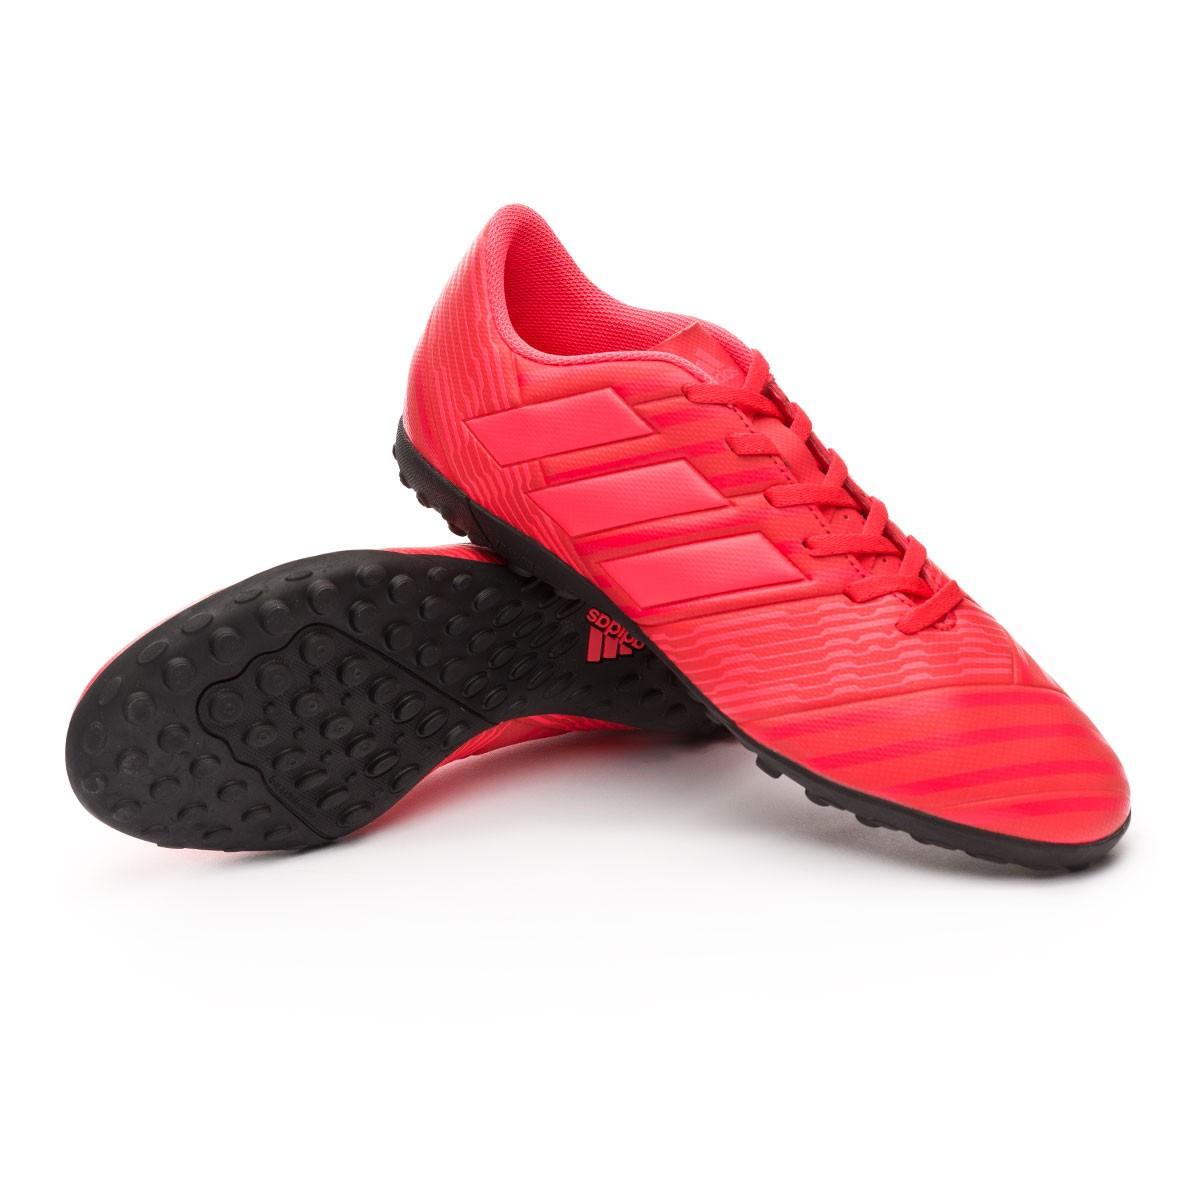 e6333eb76d7d Football Boot adidas Nemeziz Tango 17.4 Turf Real coral-Red zest ...